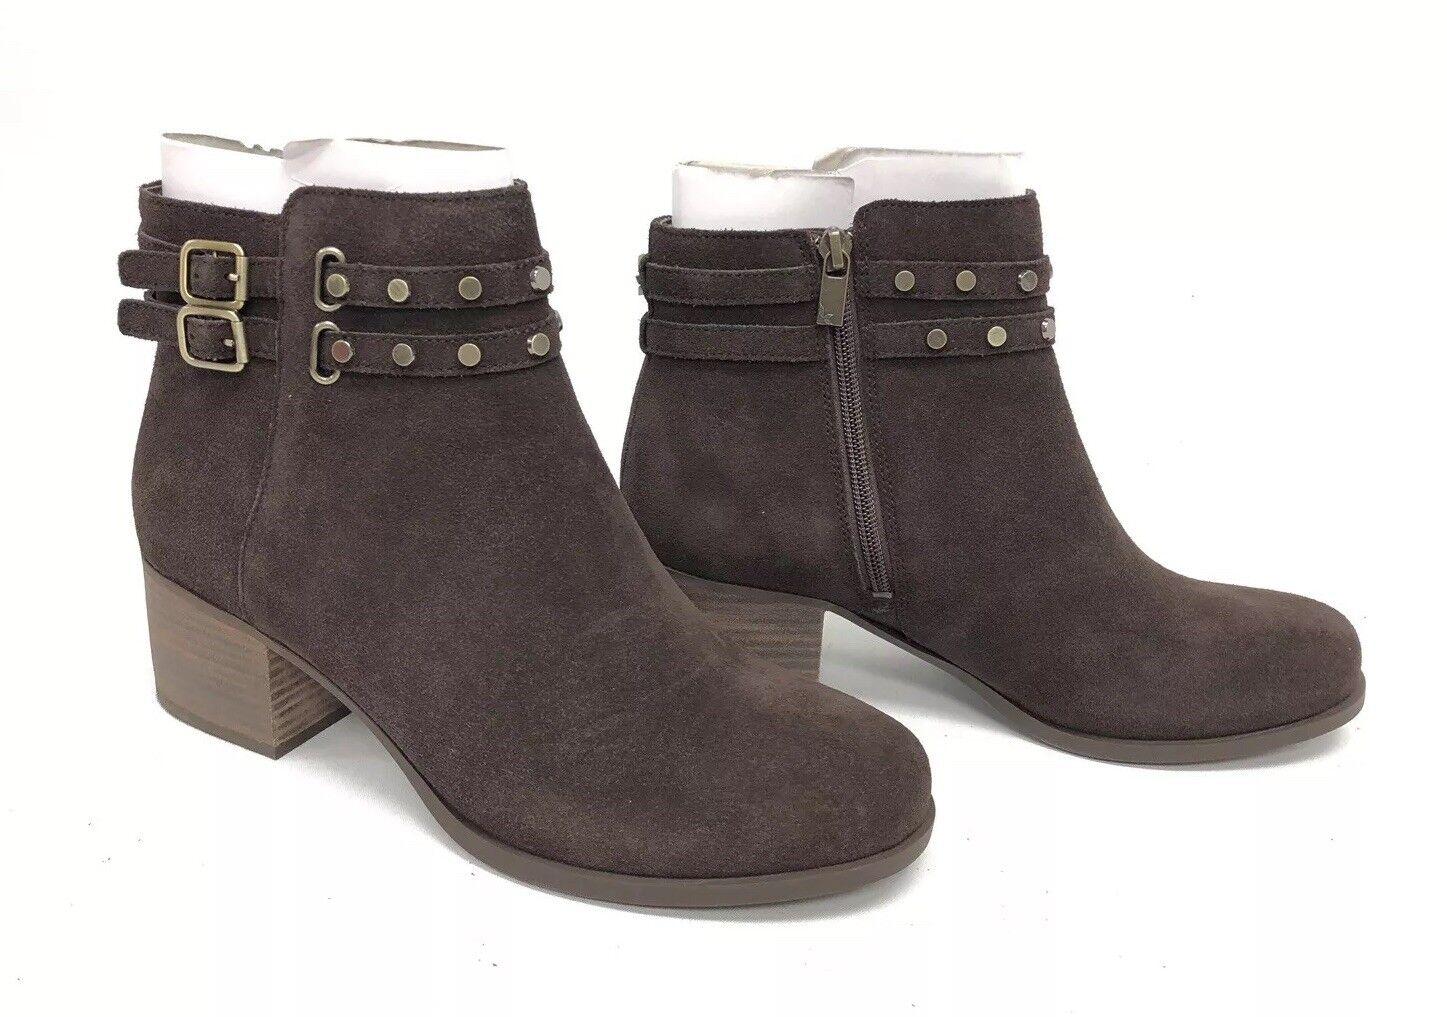 Koolaburra Gordana Suede Chocolate Brown Studded Bootie Ankle Boots 1020132